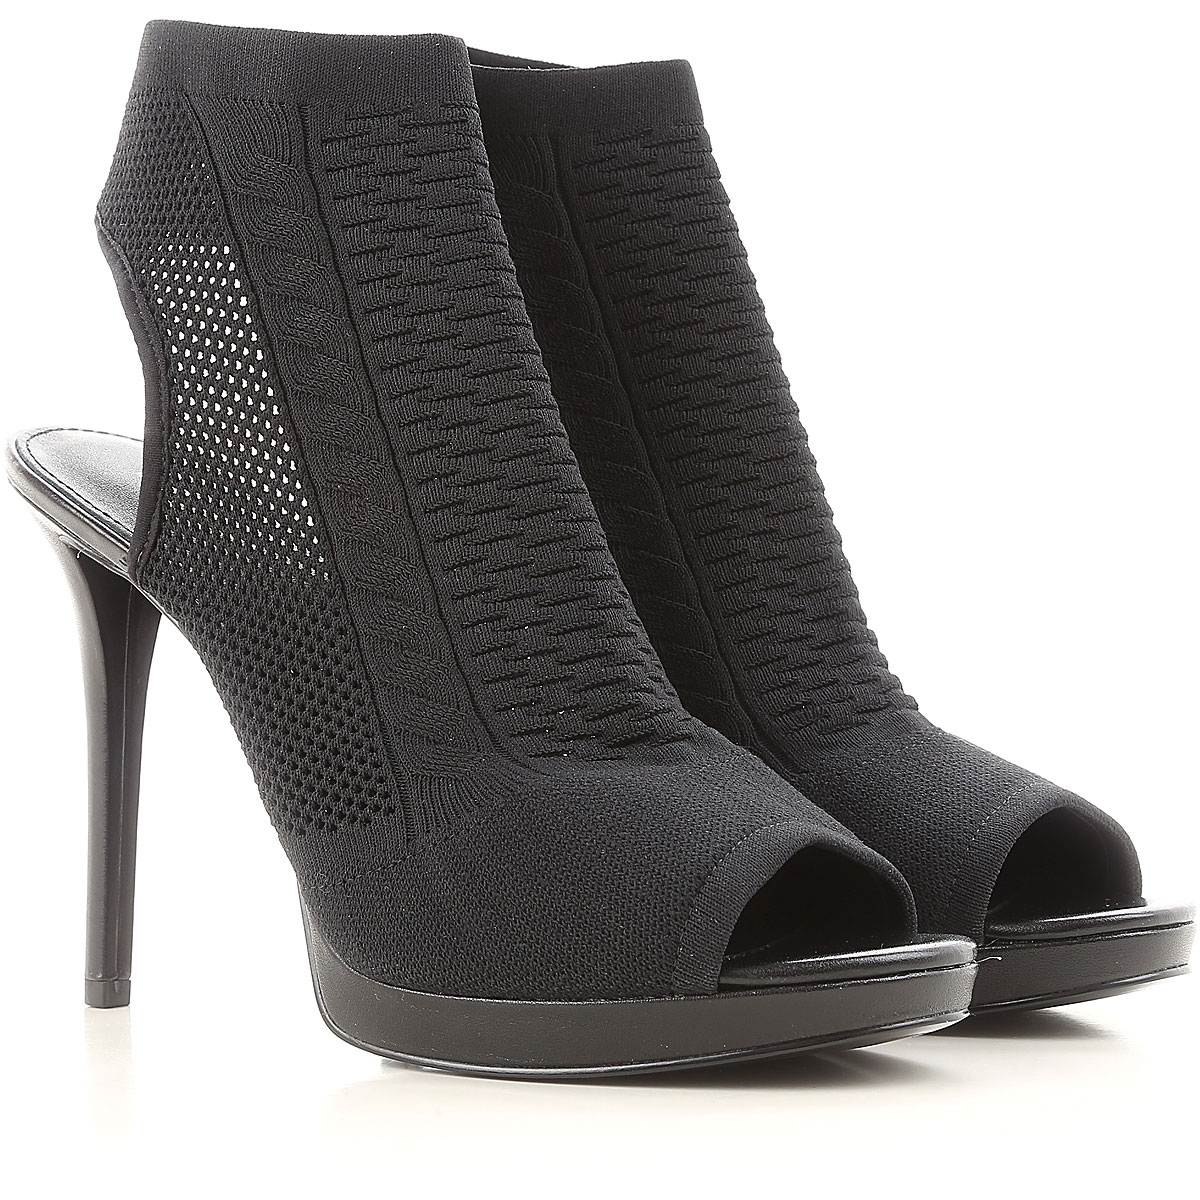 Michael Kors Peep Toe Open Shoes & Heels In Saldo, Nero, tessuto, 2019, 37 39